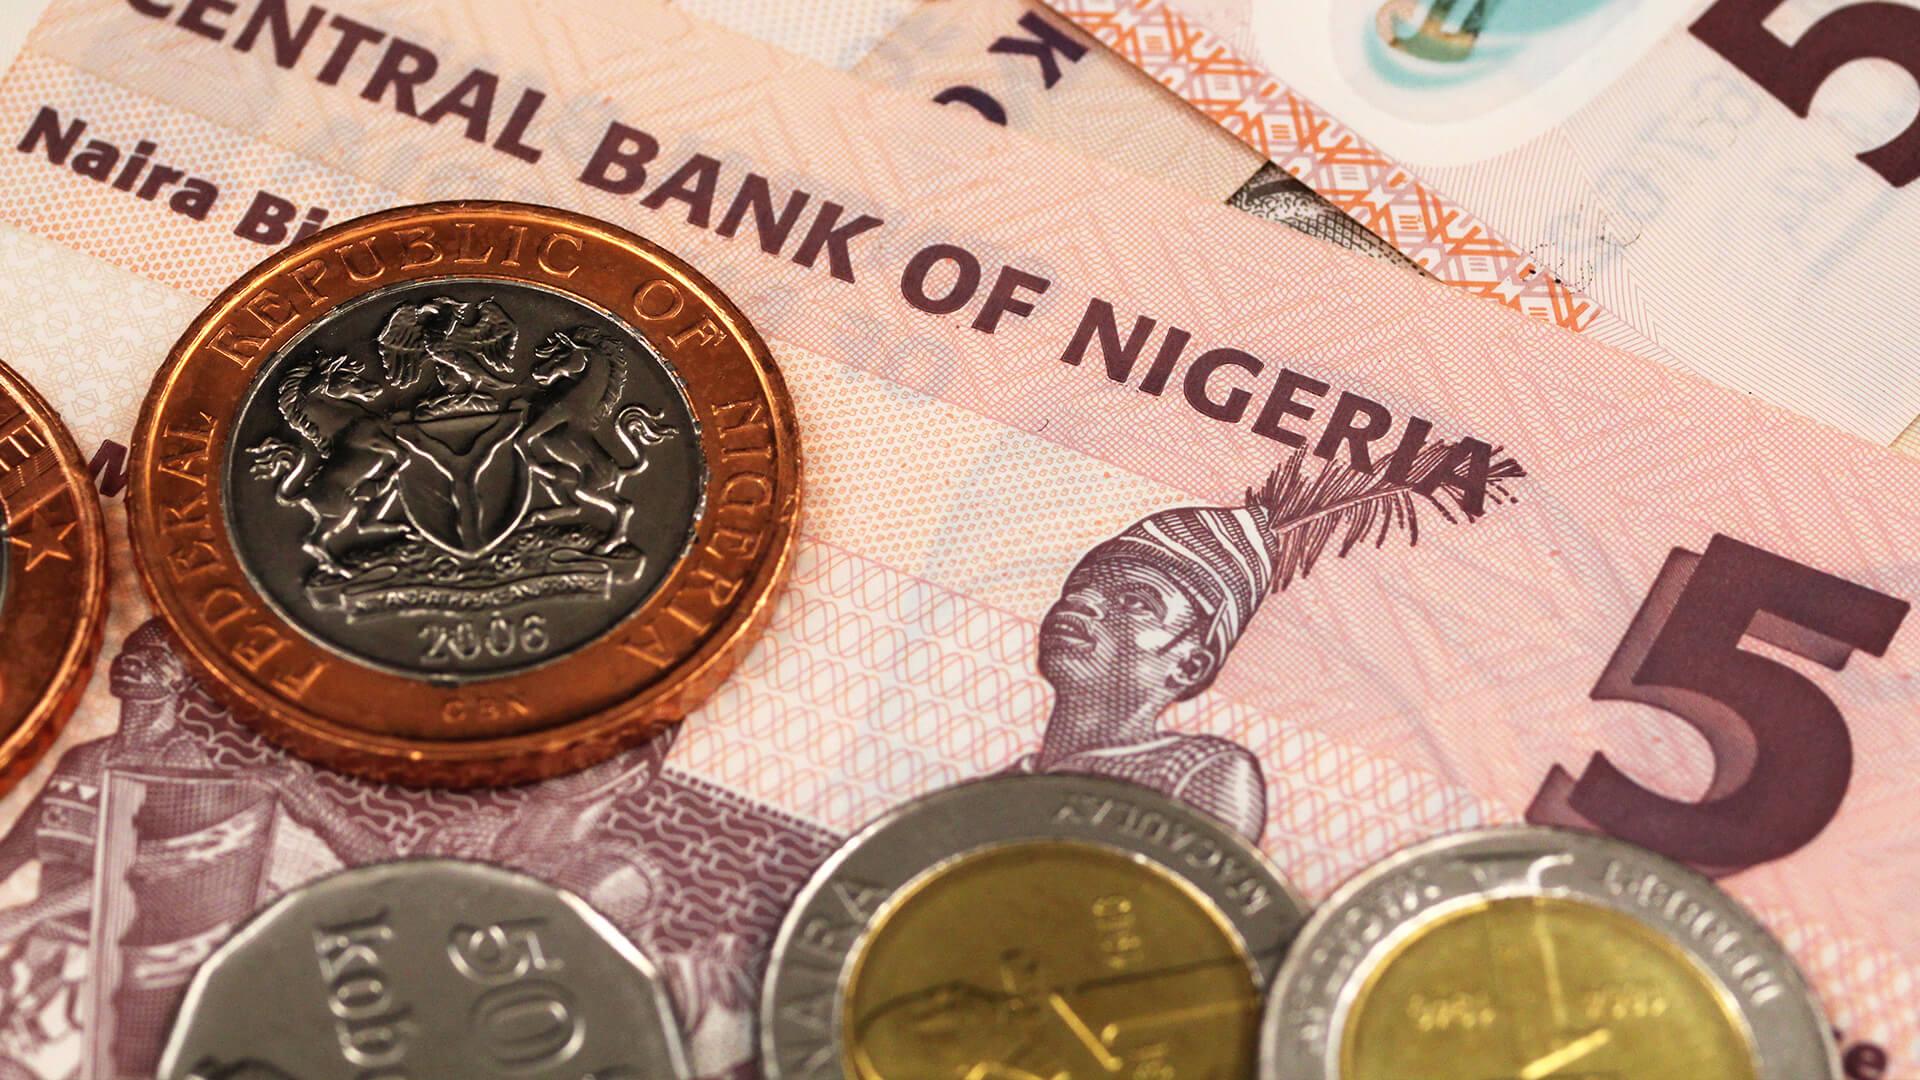 Bank of Nigeria